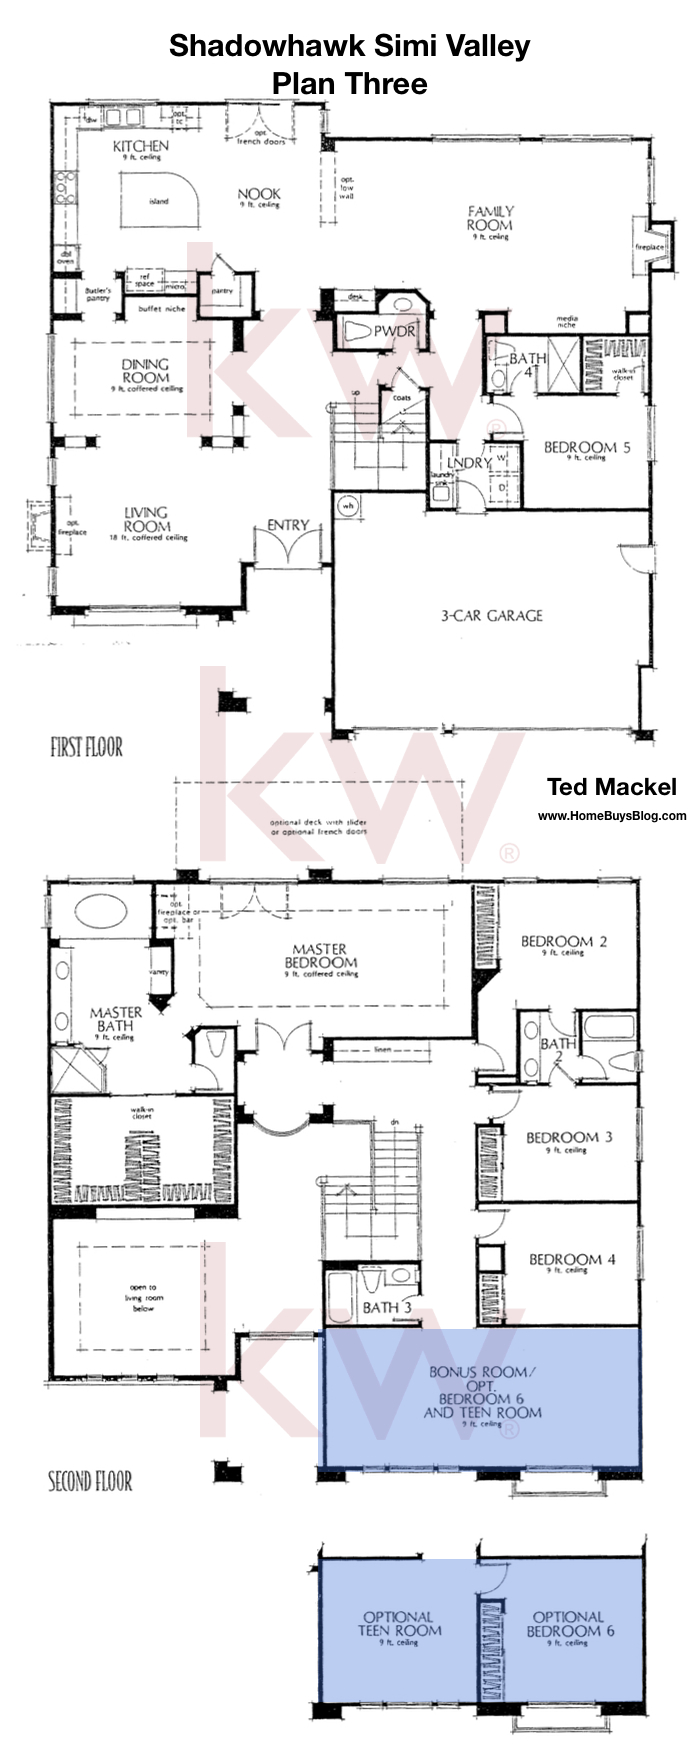 Shadowhawk Plan 3 Floor Plan Simi Valley